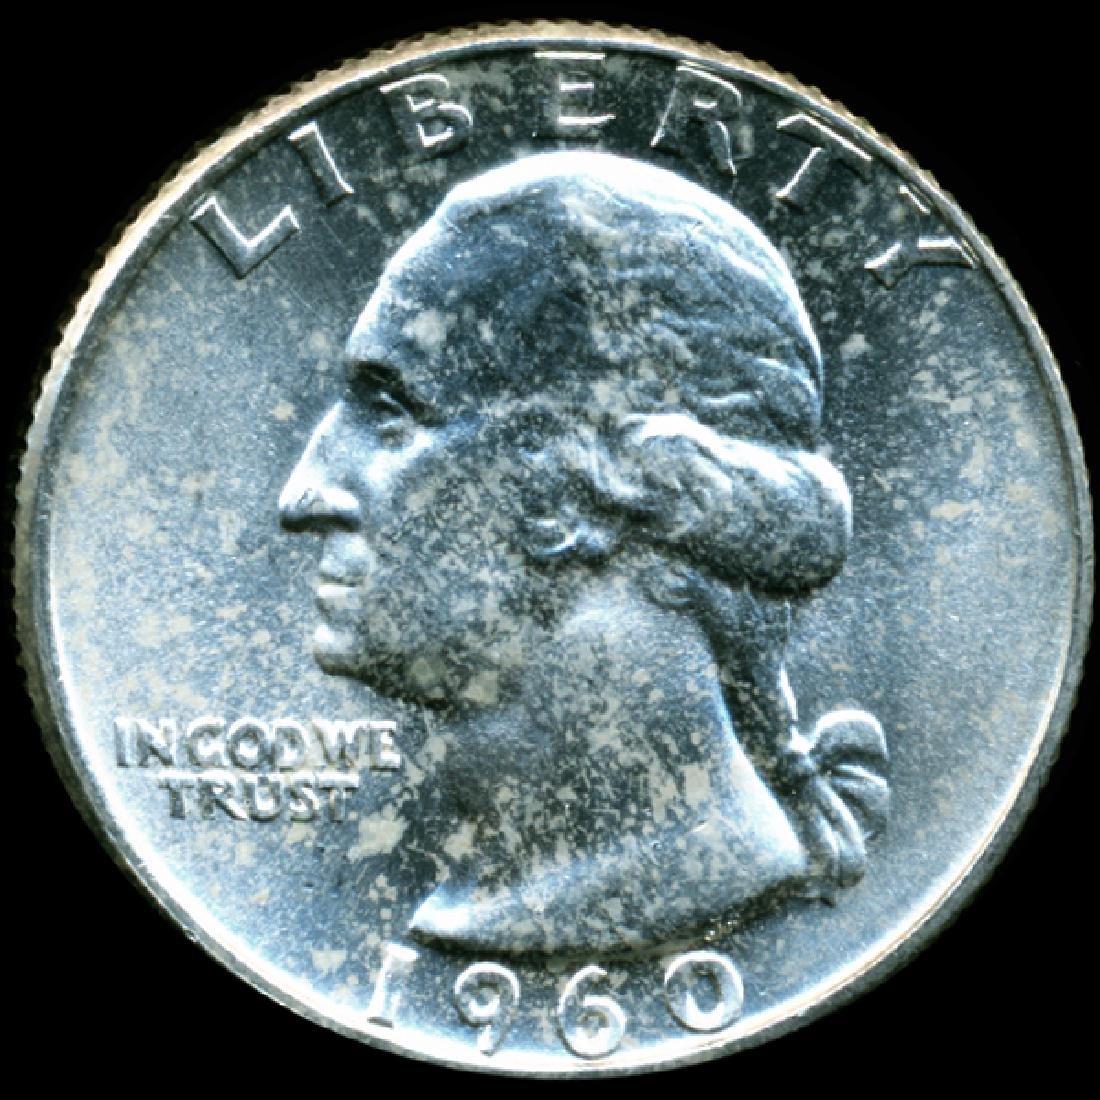 1960 Washington 25c GEM Unc